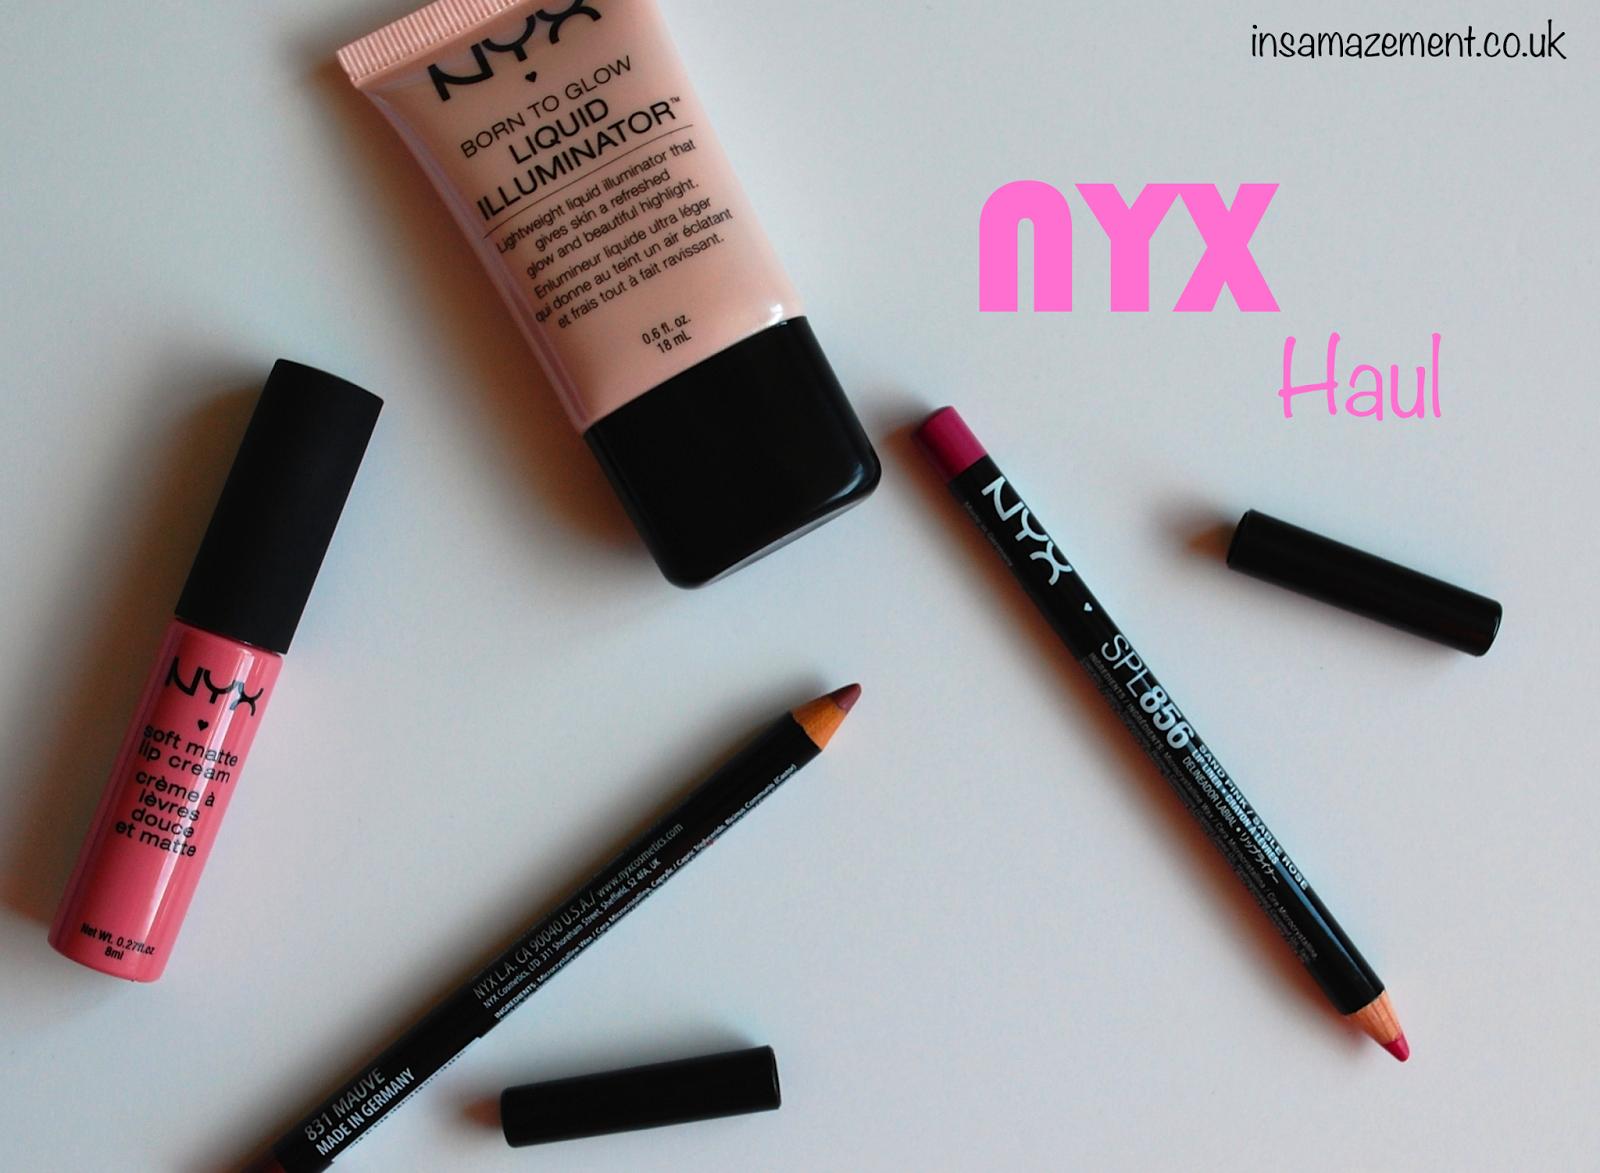 iMats Haul 1 Nyx Cosmetics (With images) Nyx cosmetics